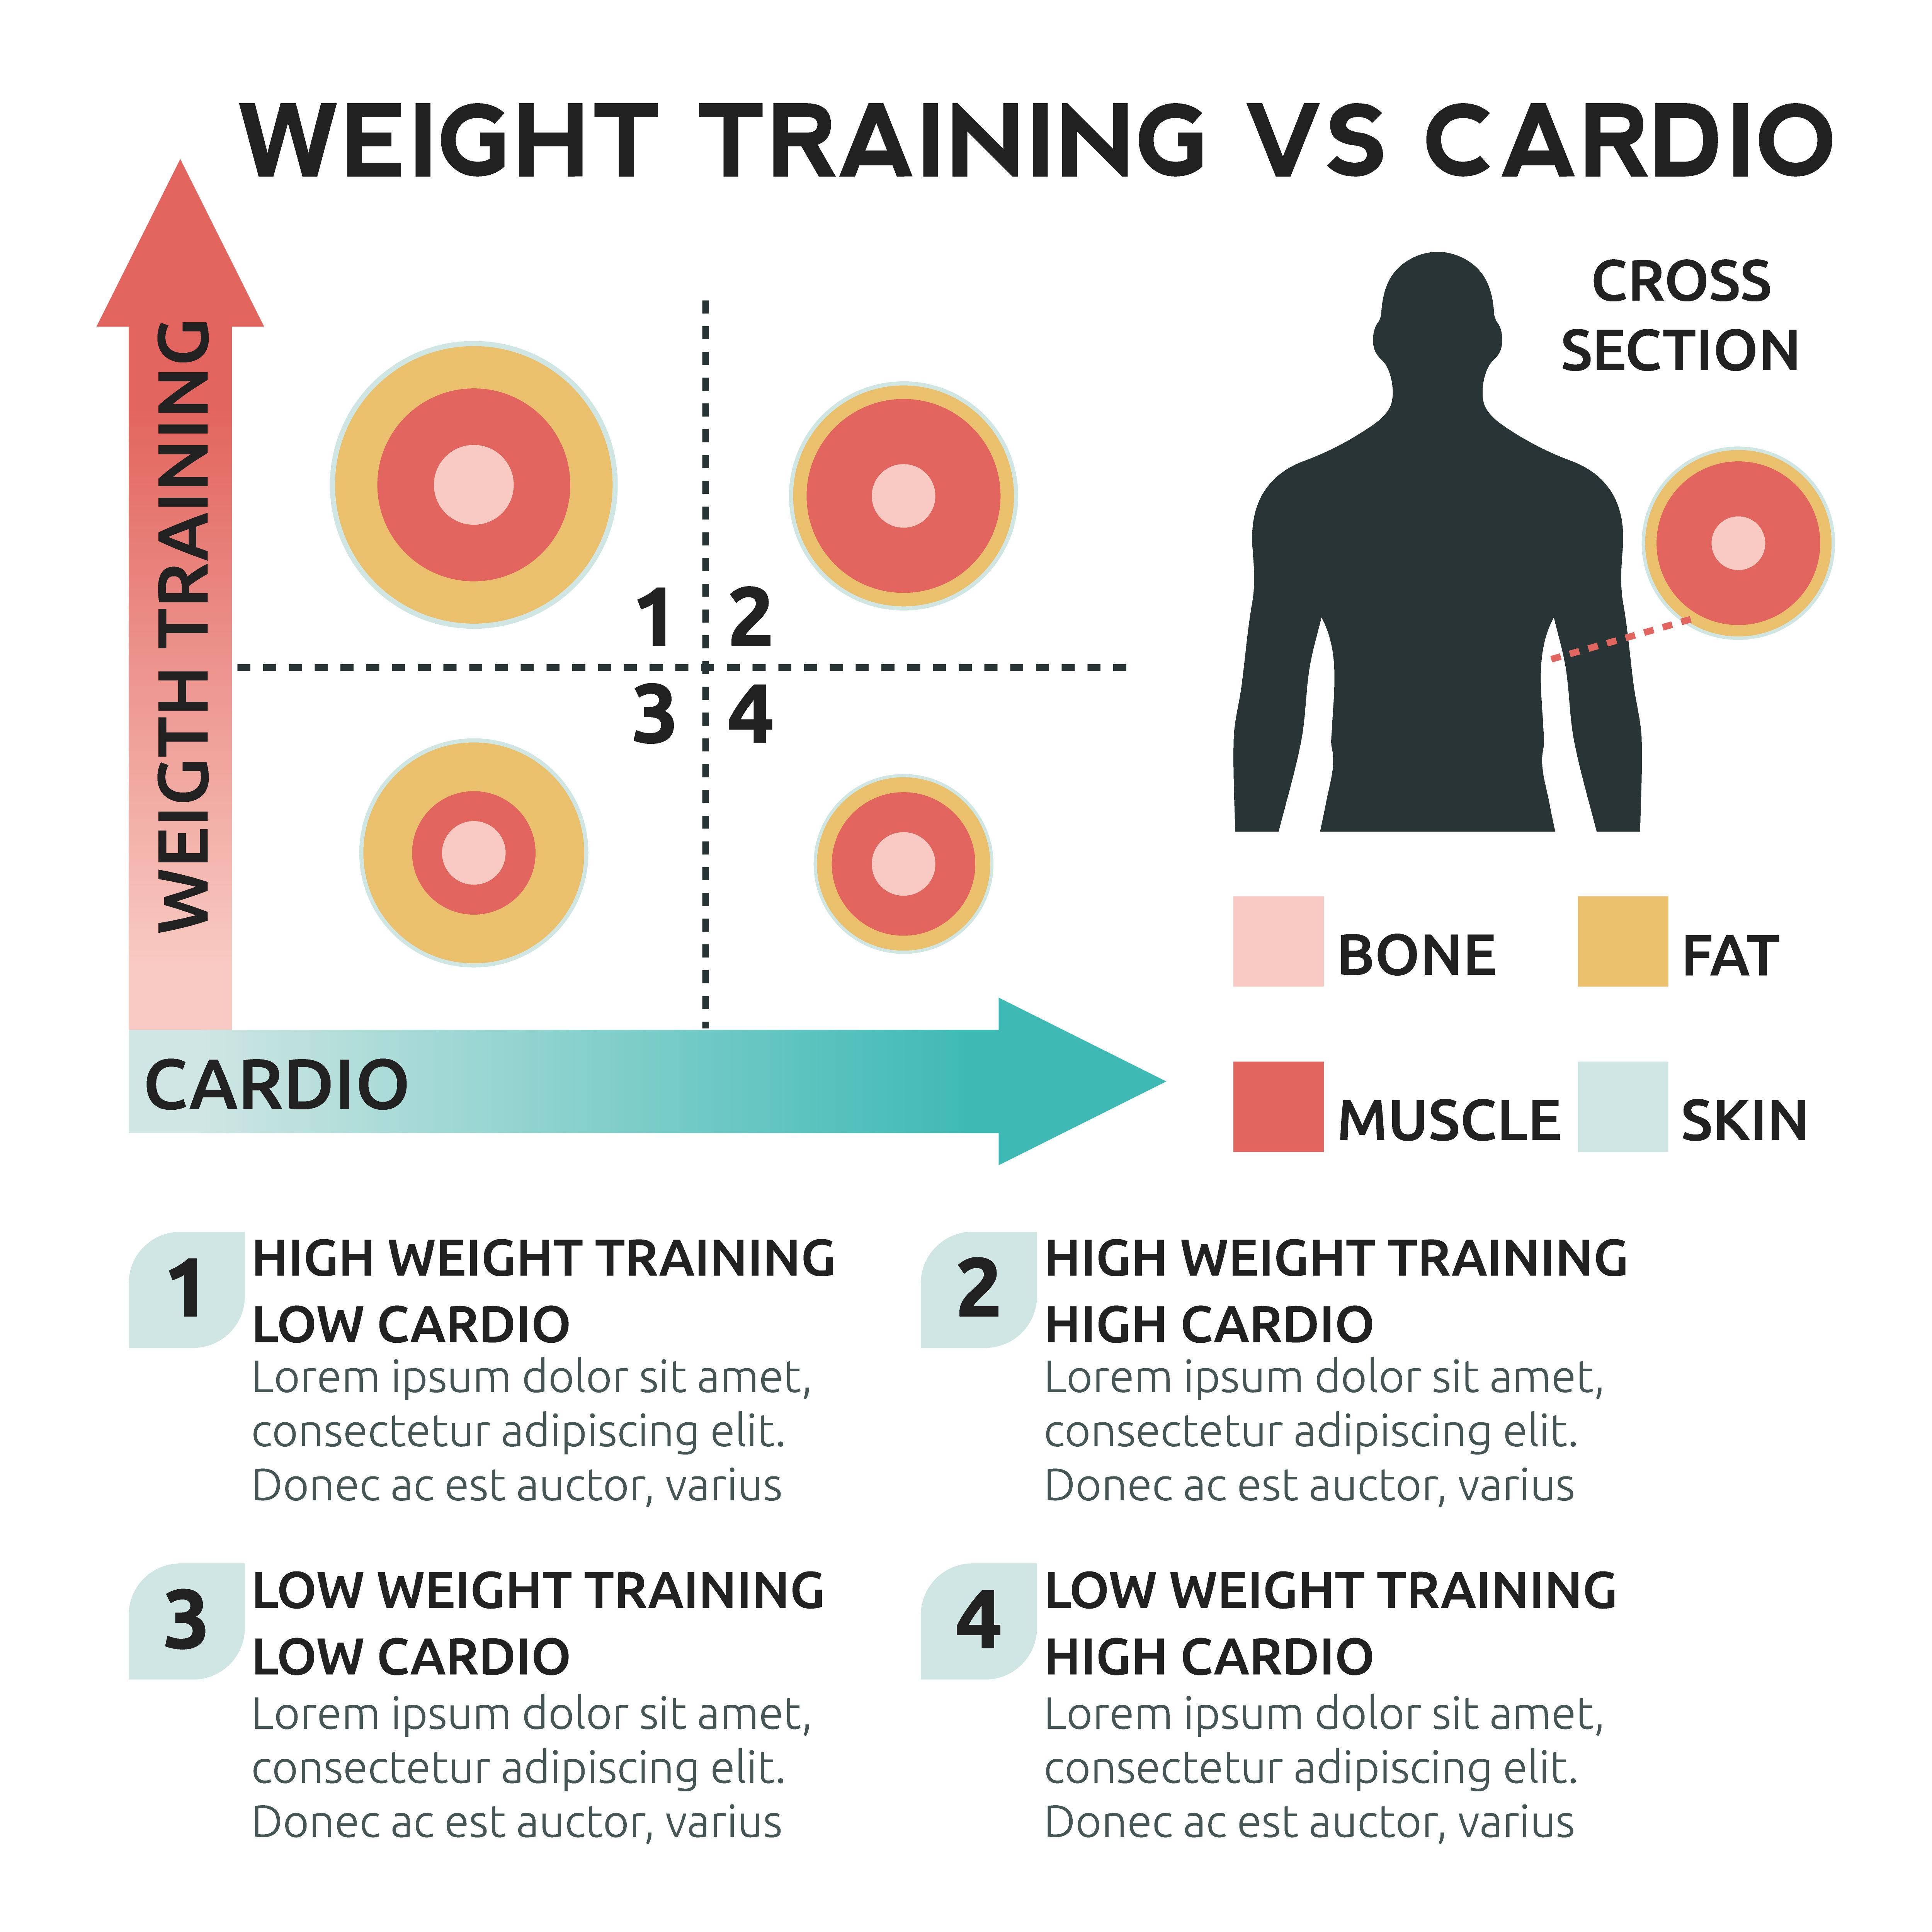 Weight Training vs Cardio